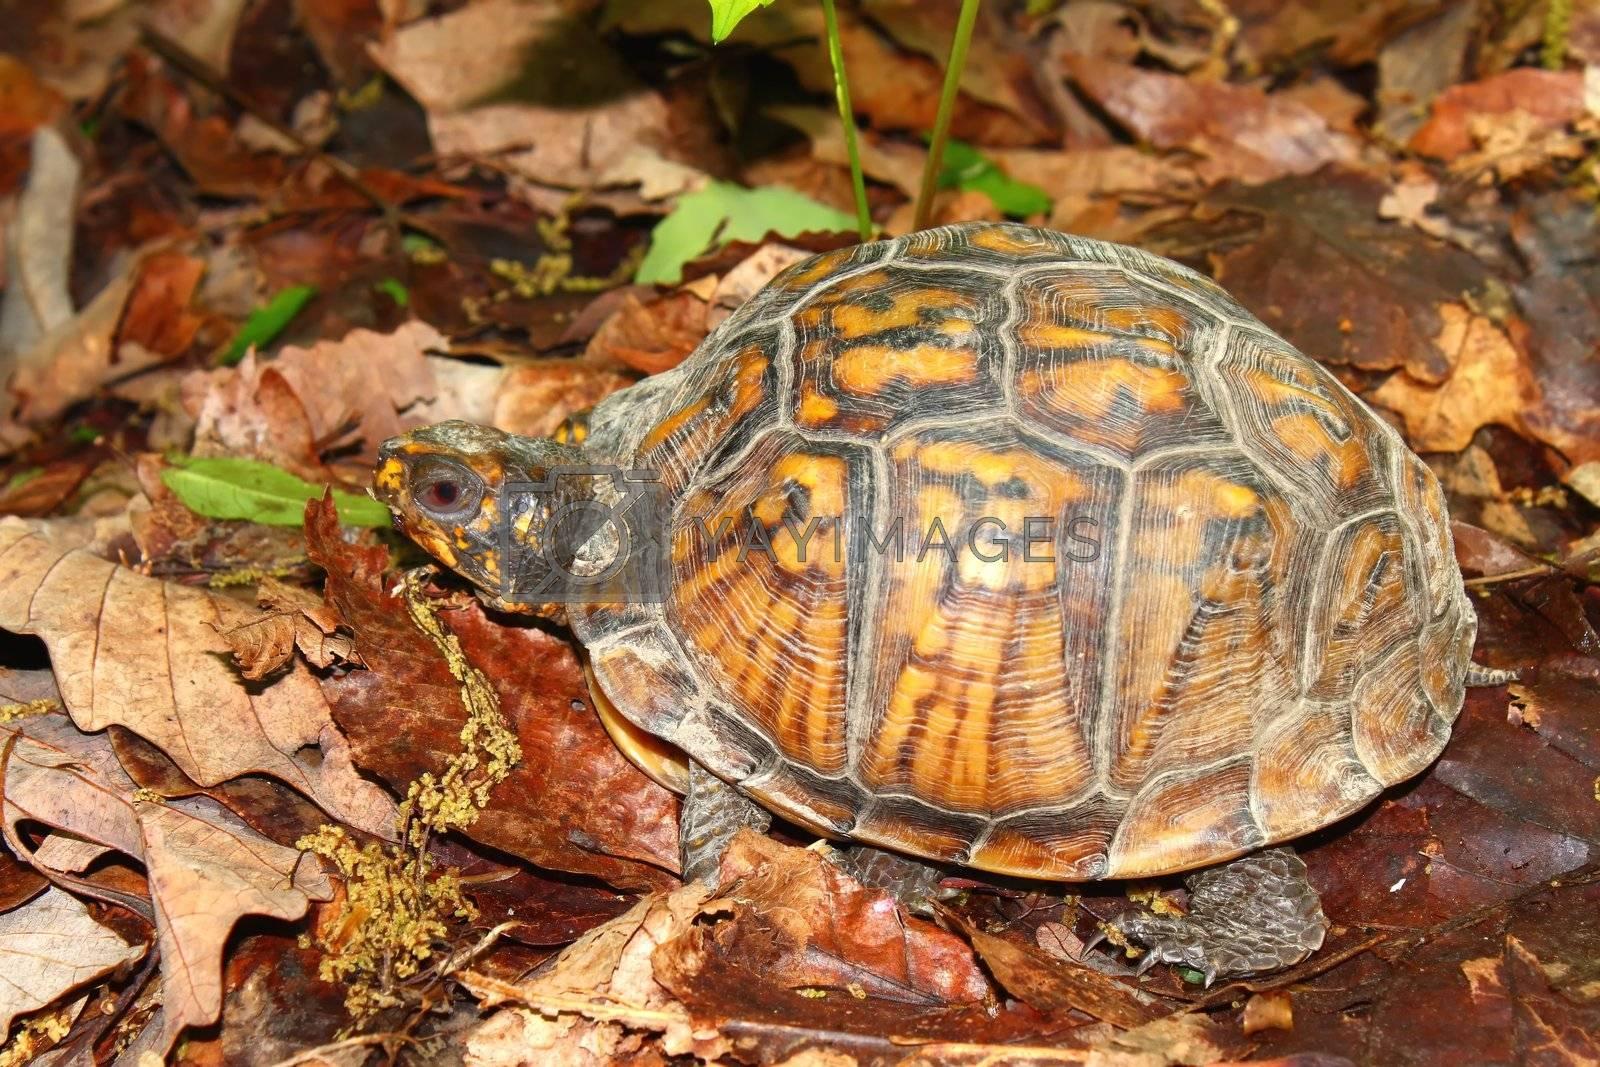 Royalty free image of Box Turtle (Terrapene carolina) by Wirepec